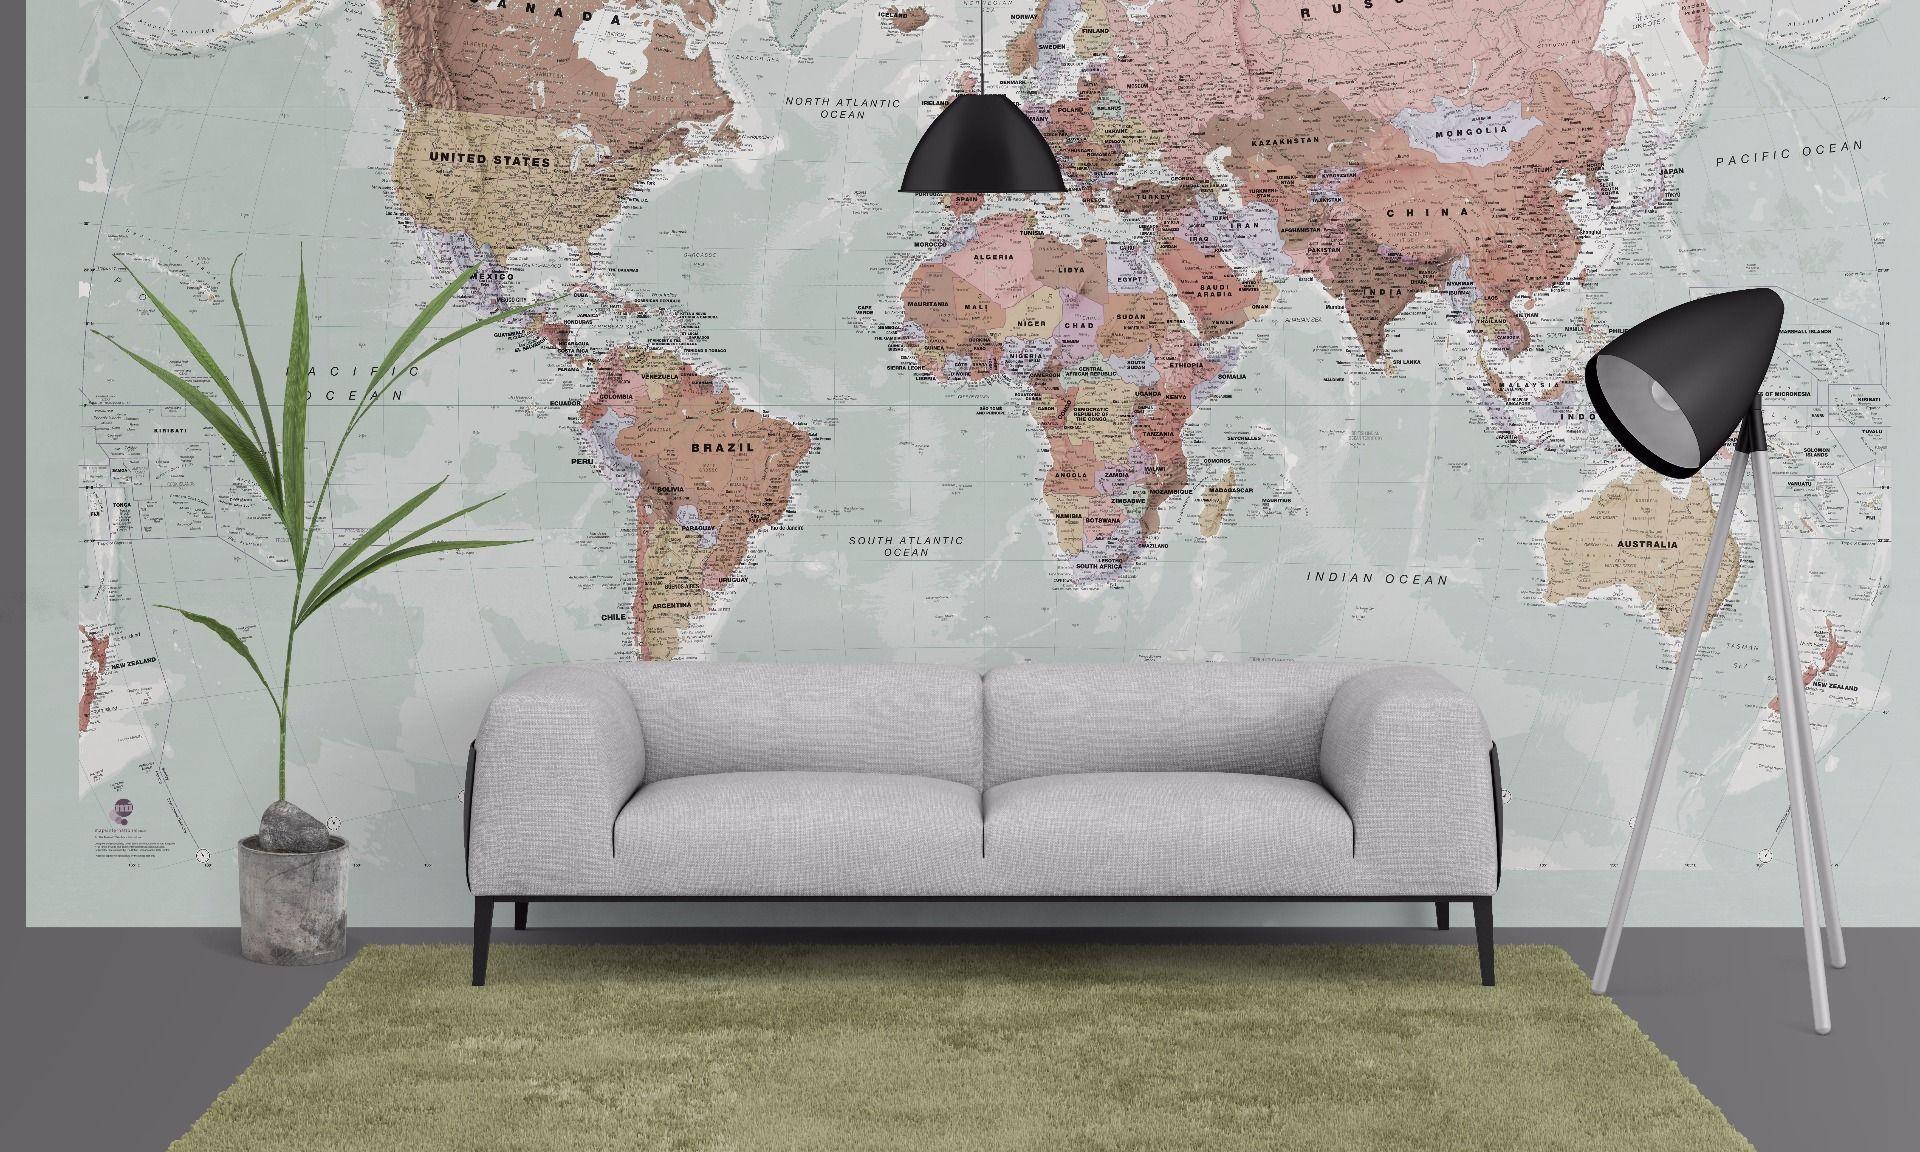 Executive World Map Wallpaper - World Map Wallpaper For Wall , HD Wallpaper & Backgrounds